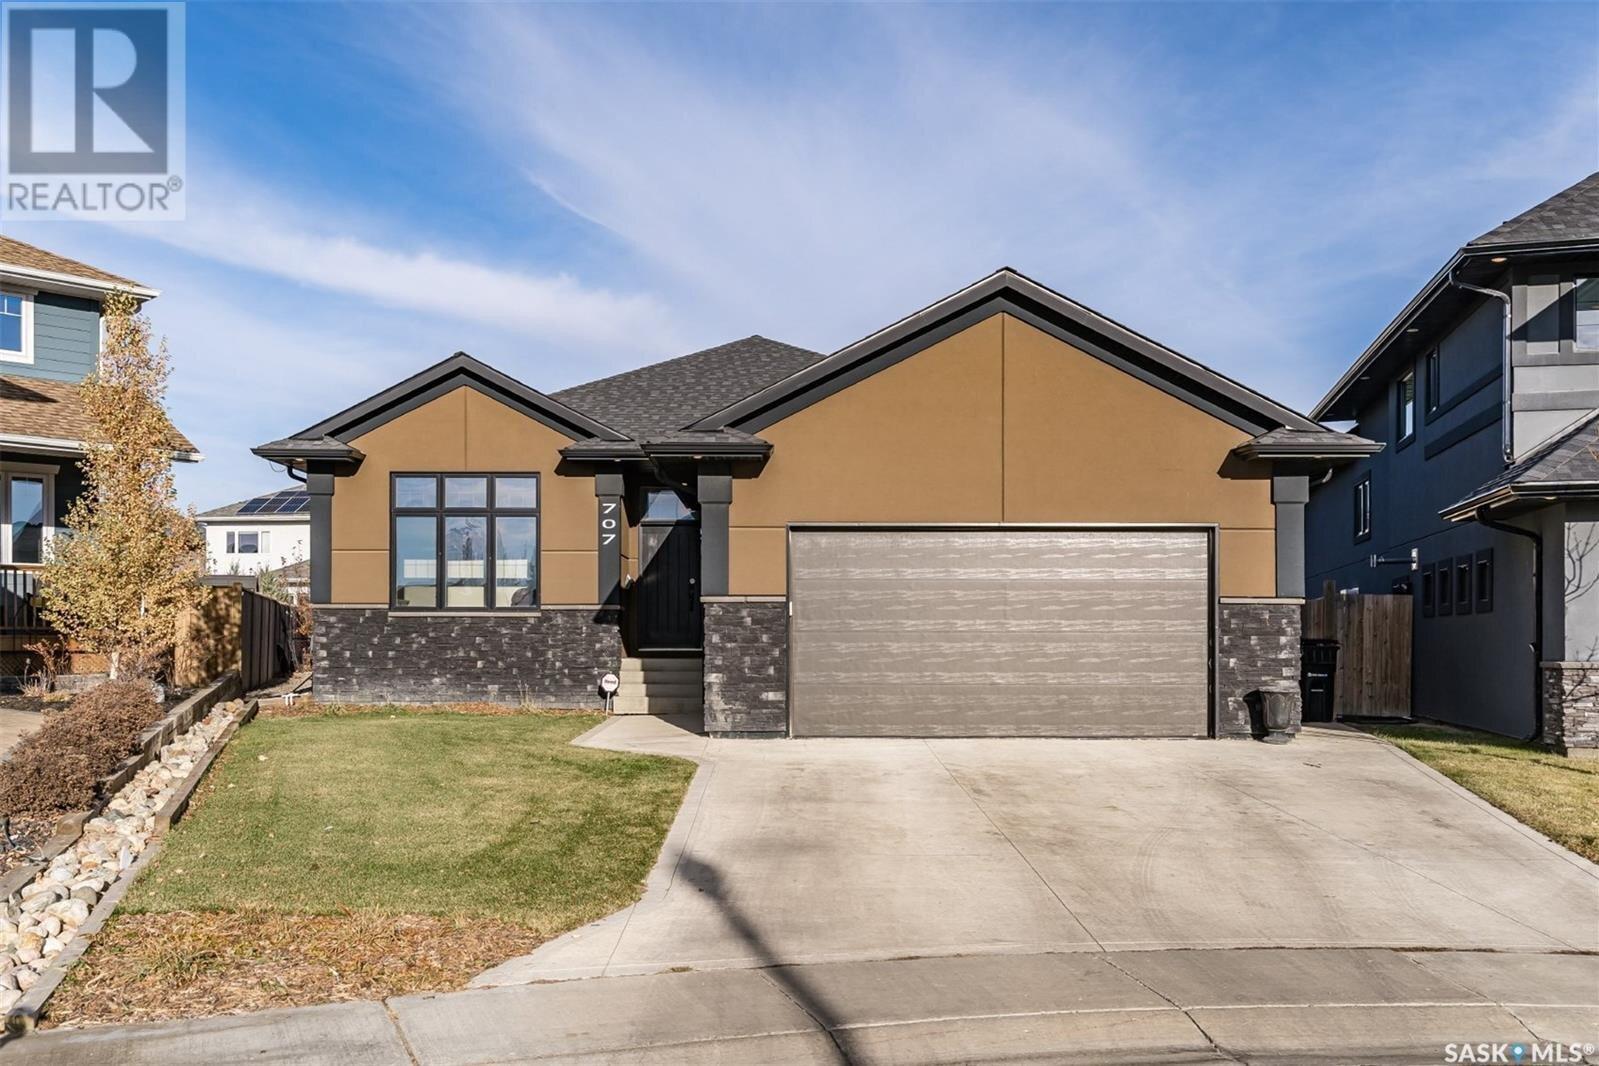 House for sale at 707 Wilkins By Saskatoon Saskatchewan - MLS: SK832044